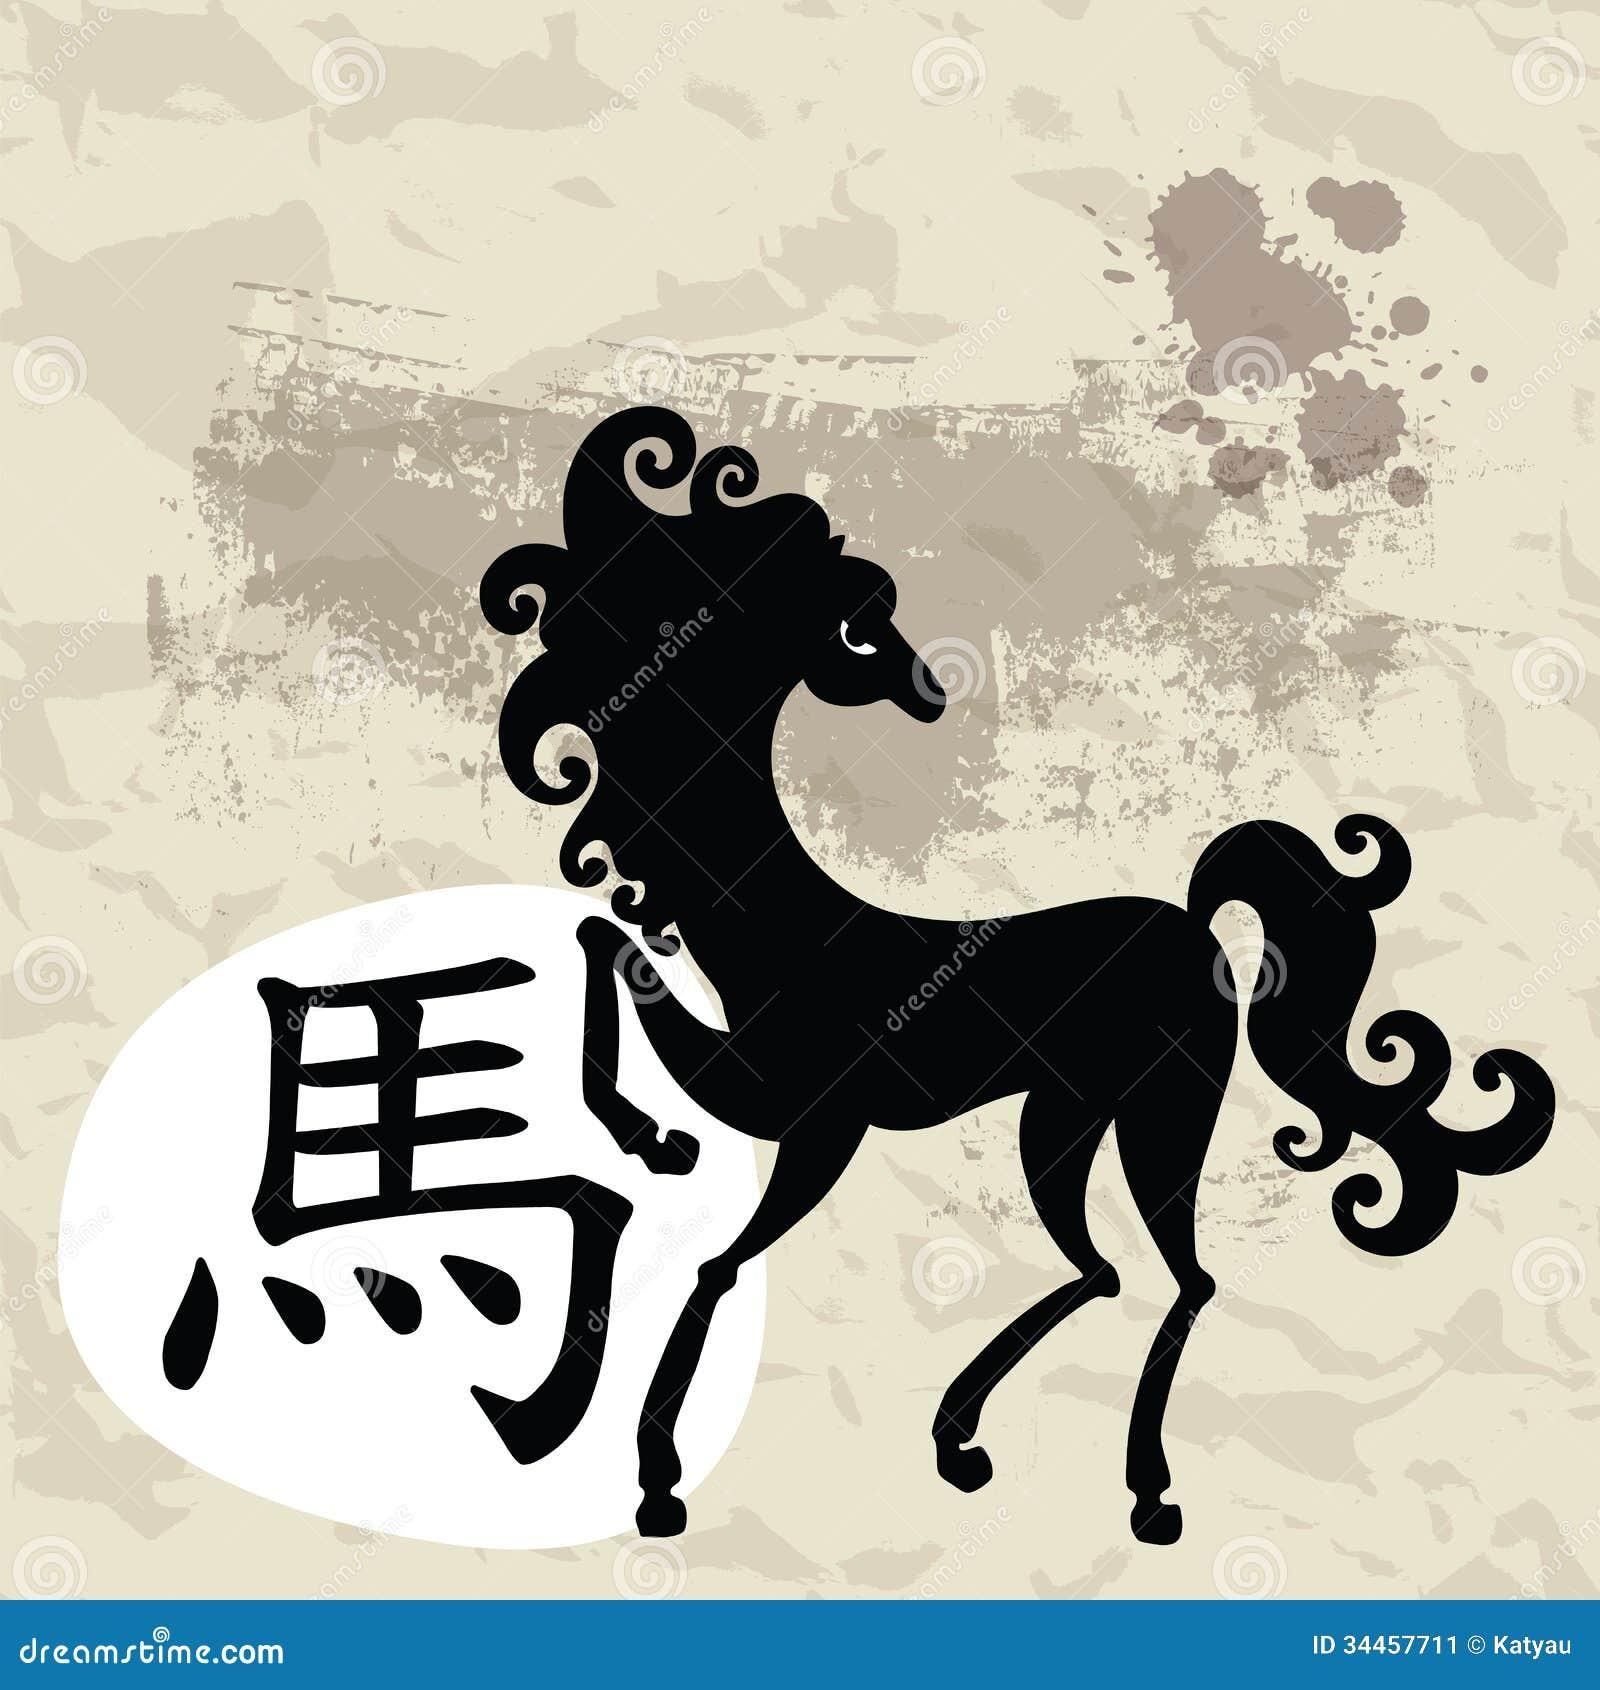 Year of the horse 2014 stock illustration illustration of china royalty free stock photo biocorpaavc